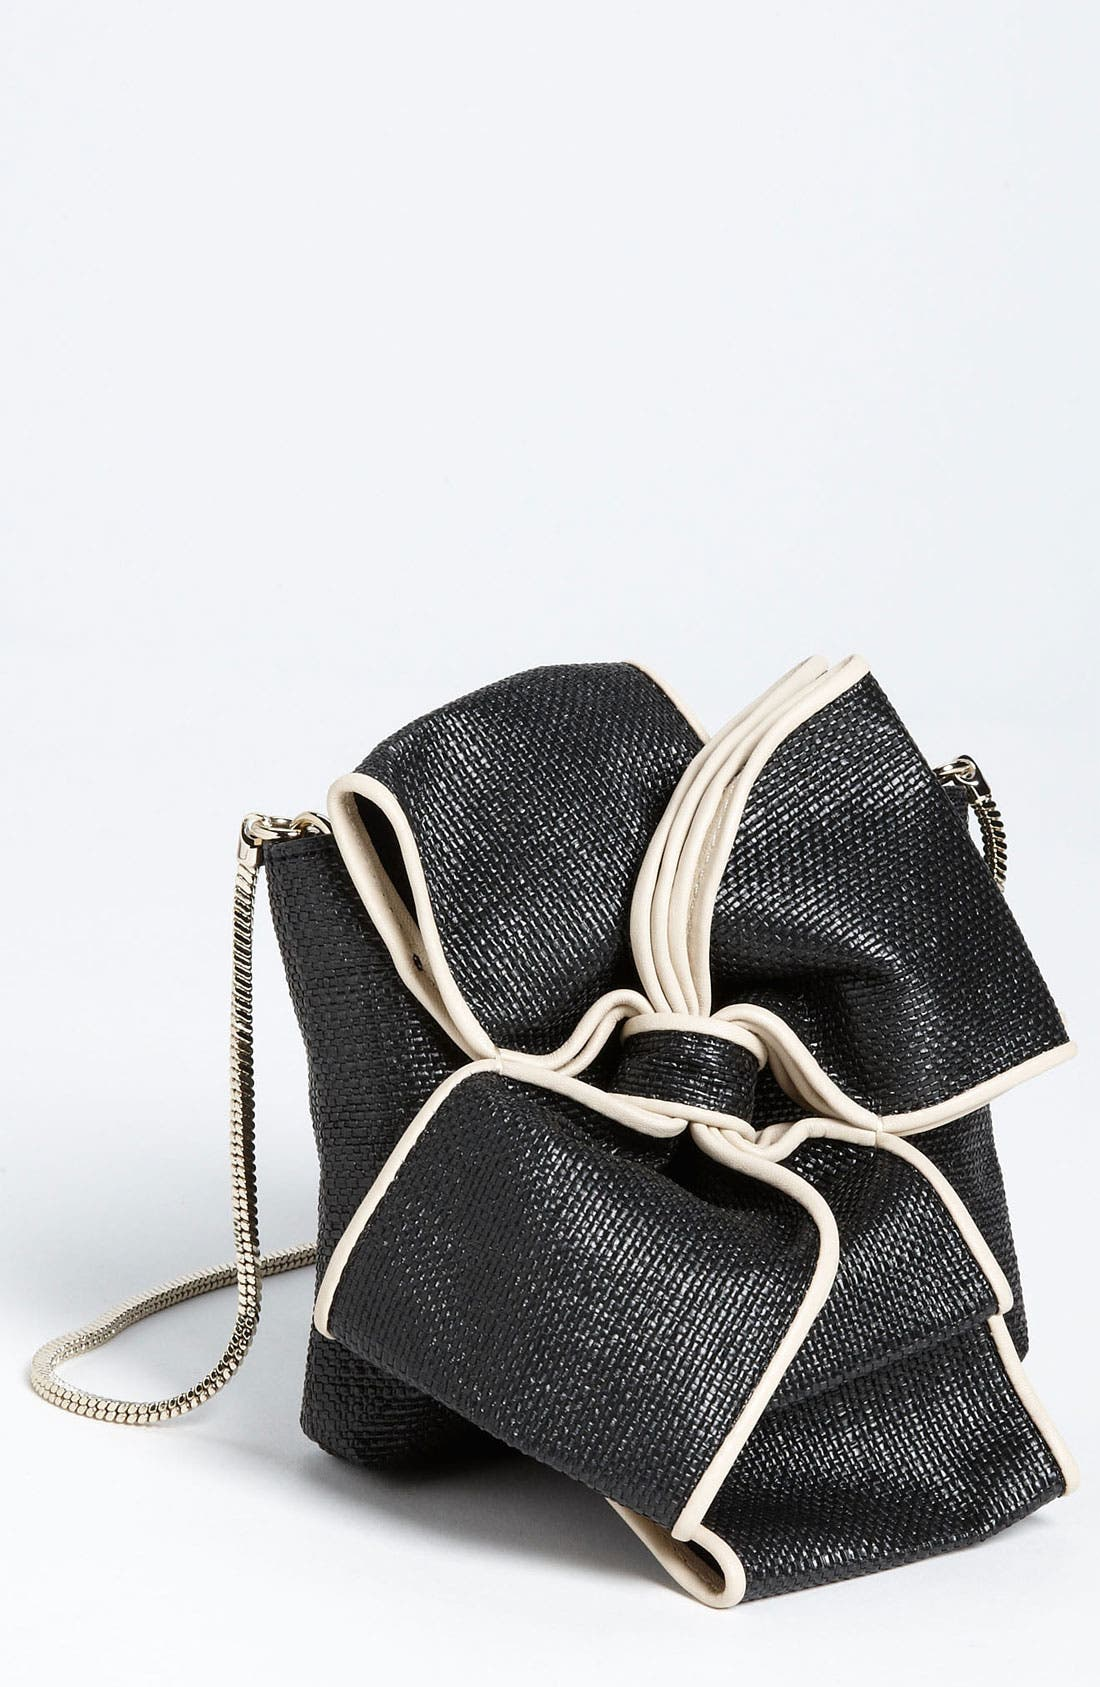 Alternate Image 1 Selected - kate spade new york 'hope avenue - attie' crossbody bag